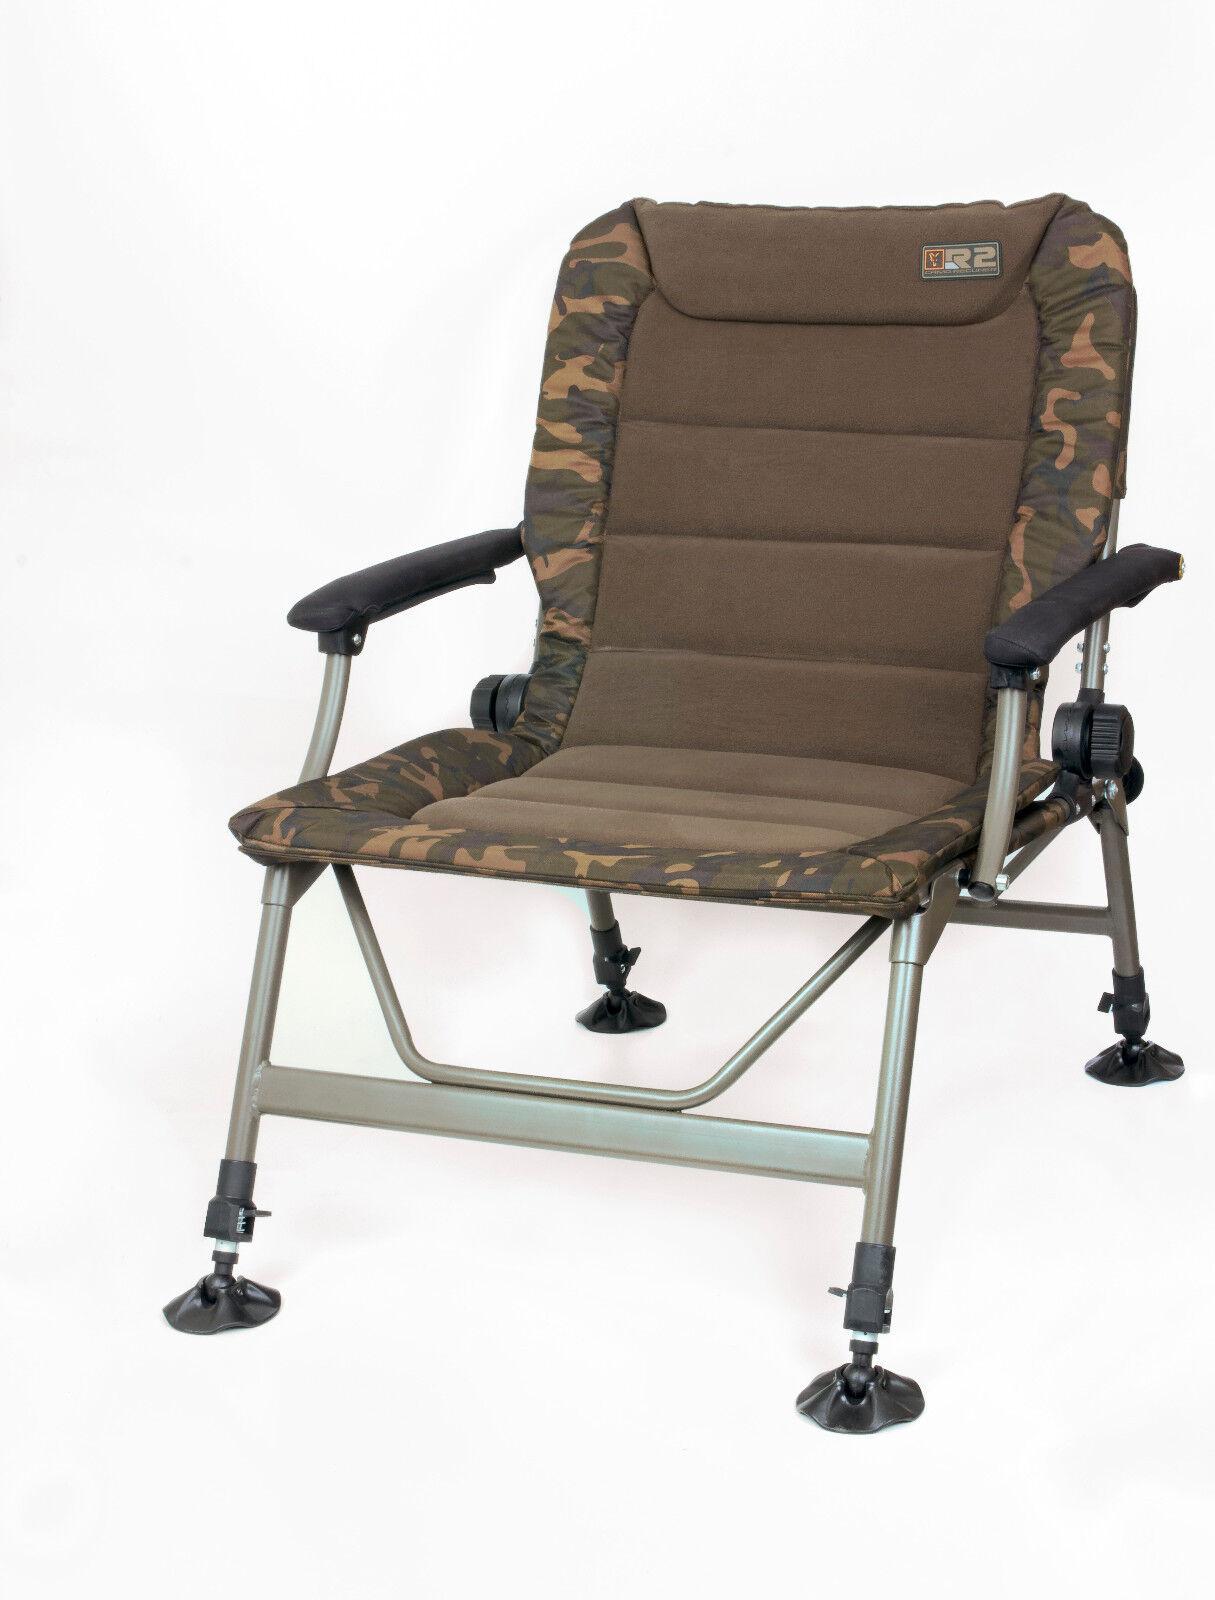 Fox R2 Camo Chair CBC061 Karpfenstuhl Carpchair Angelstuhl Stuhl Sitz Anglersitz